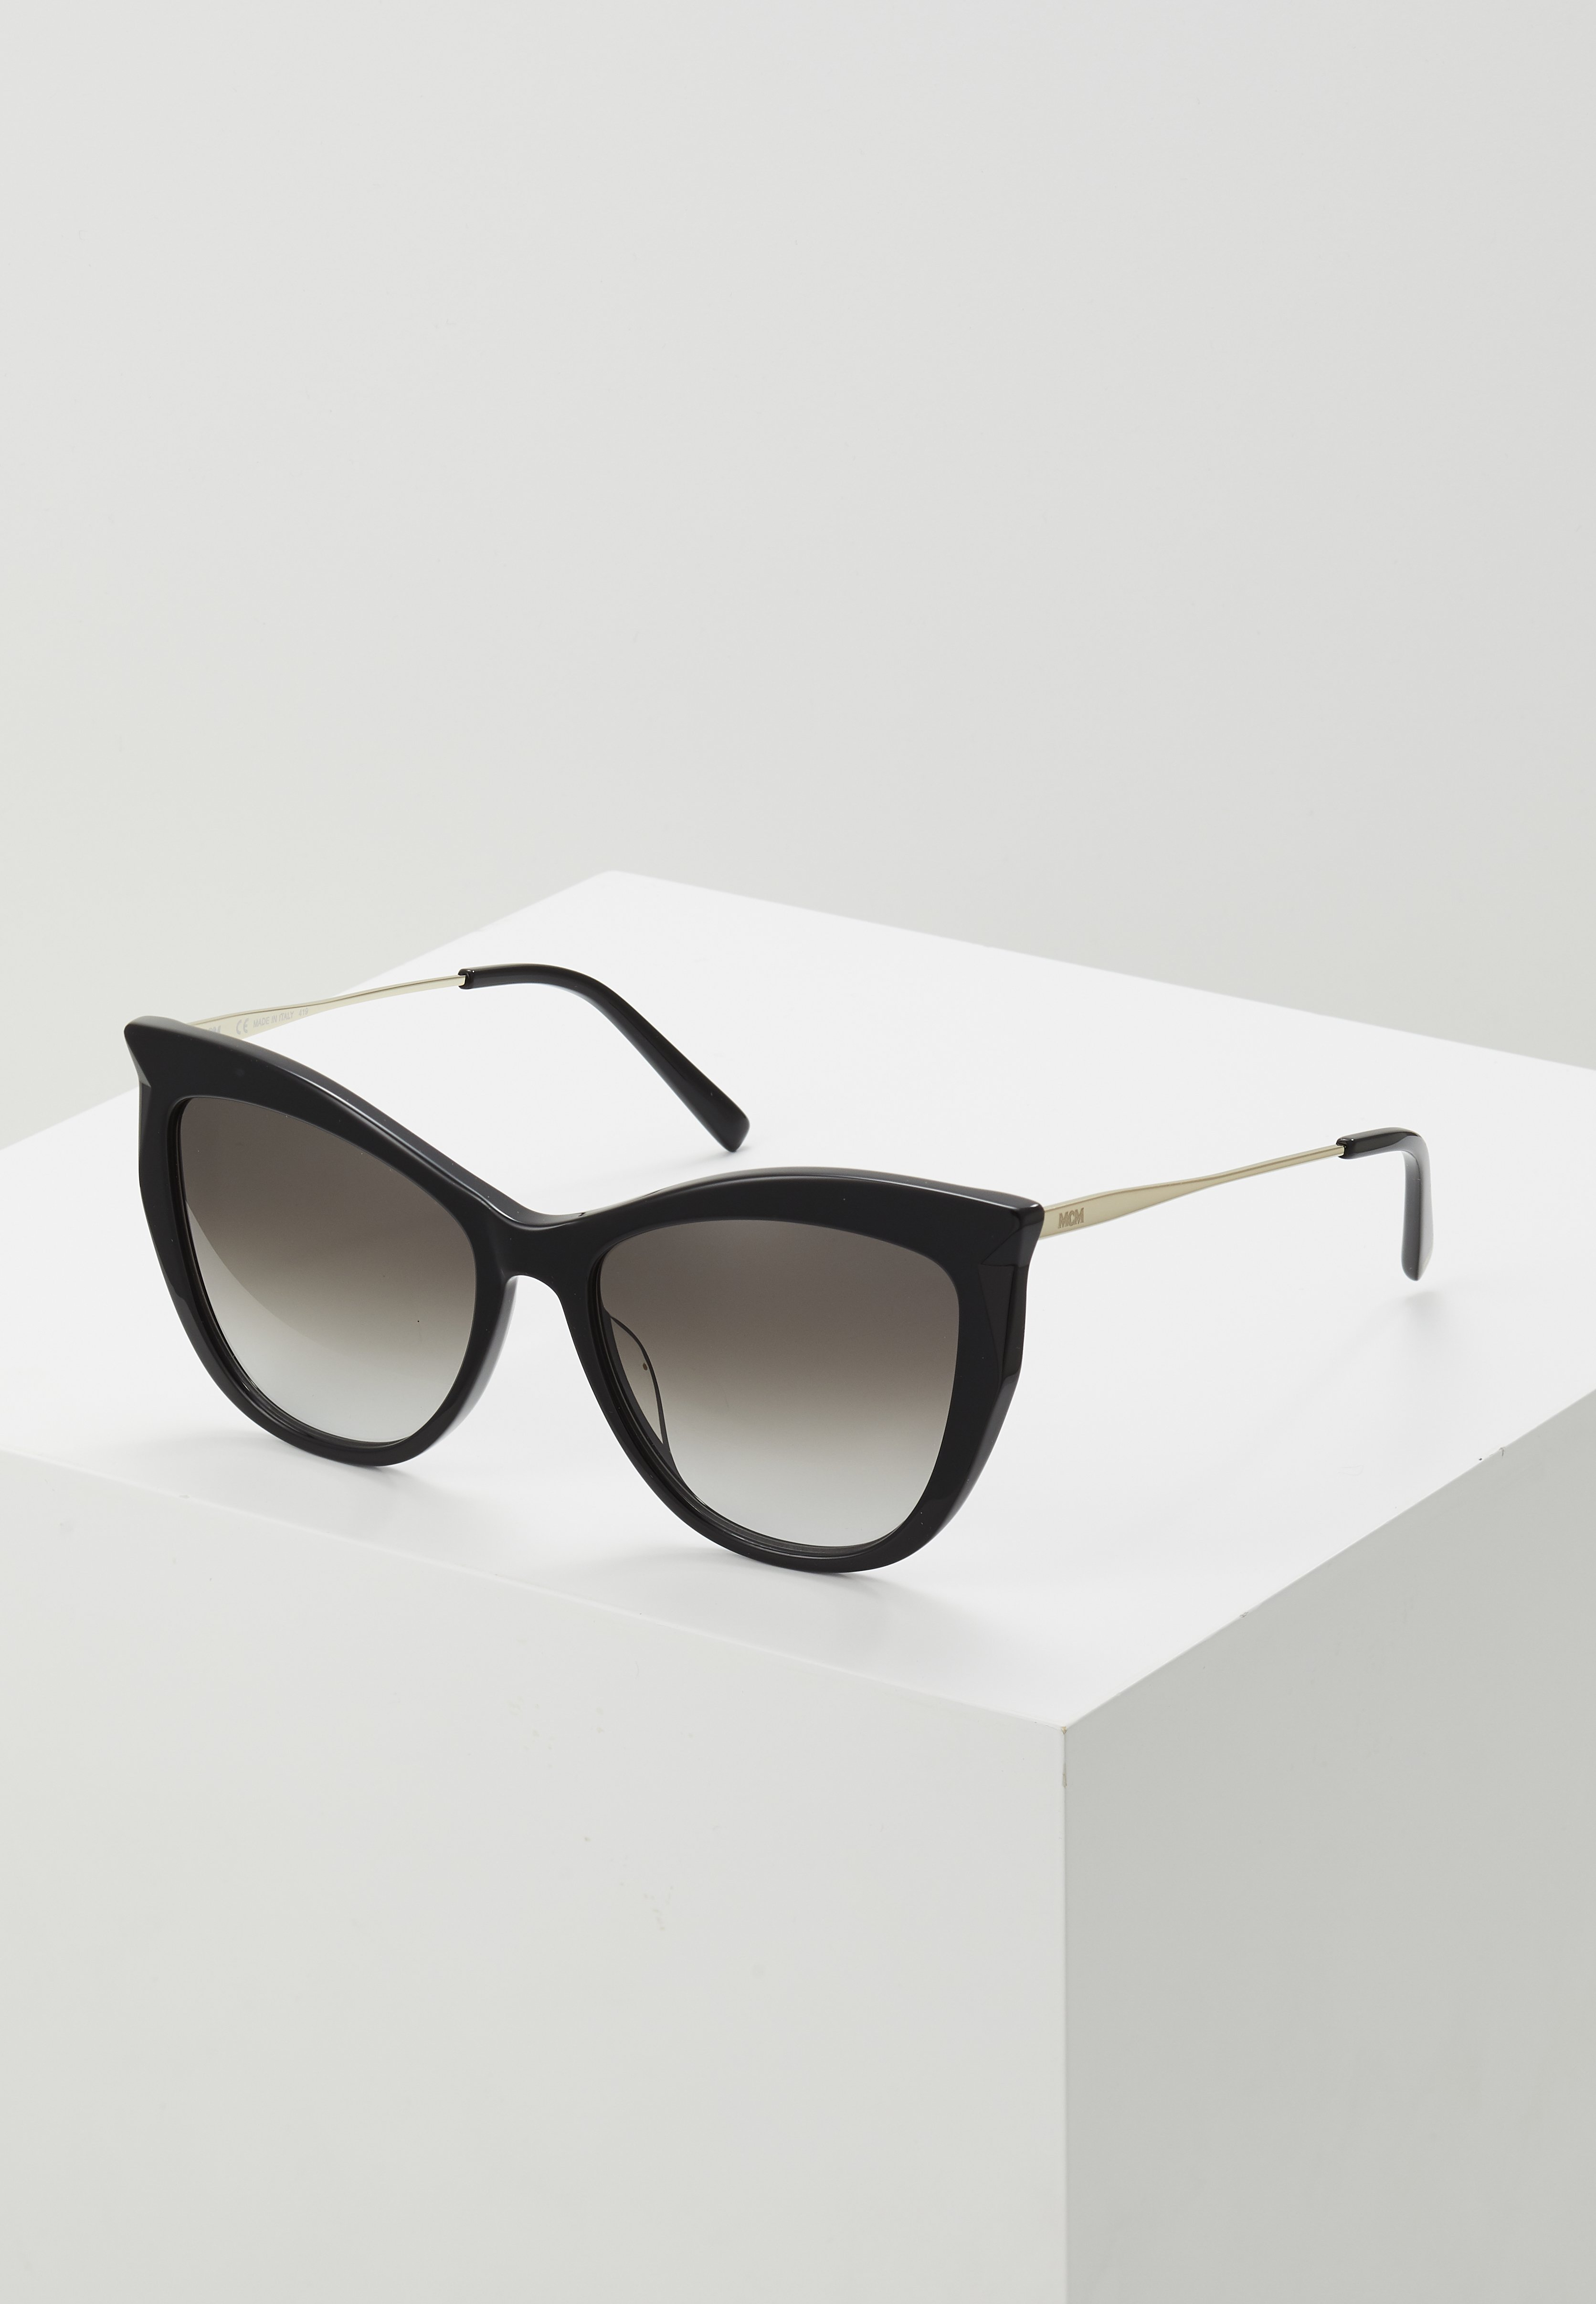 MCM Sunglasses - black